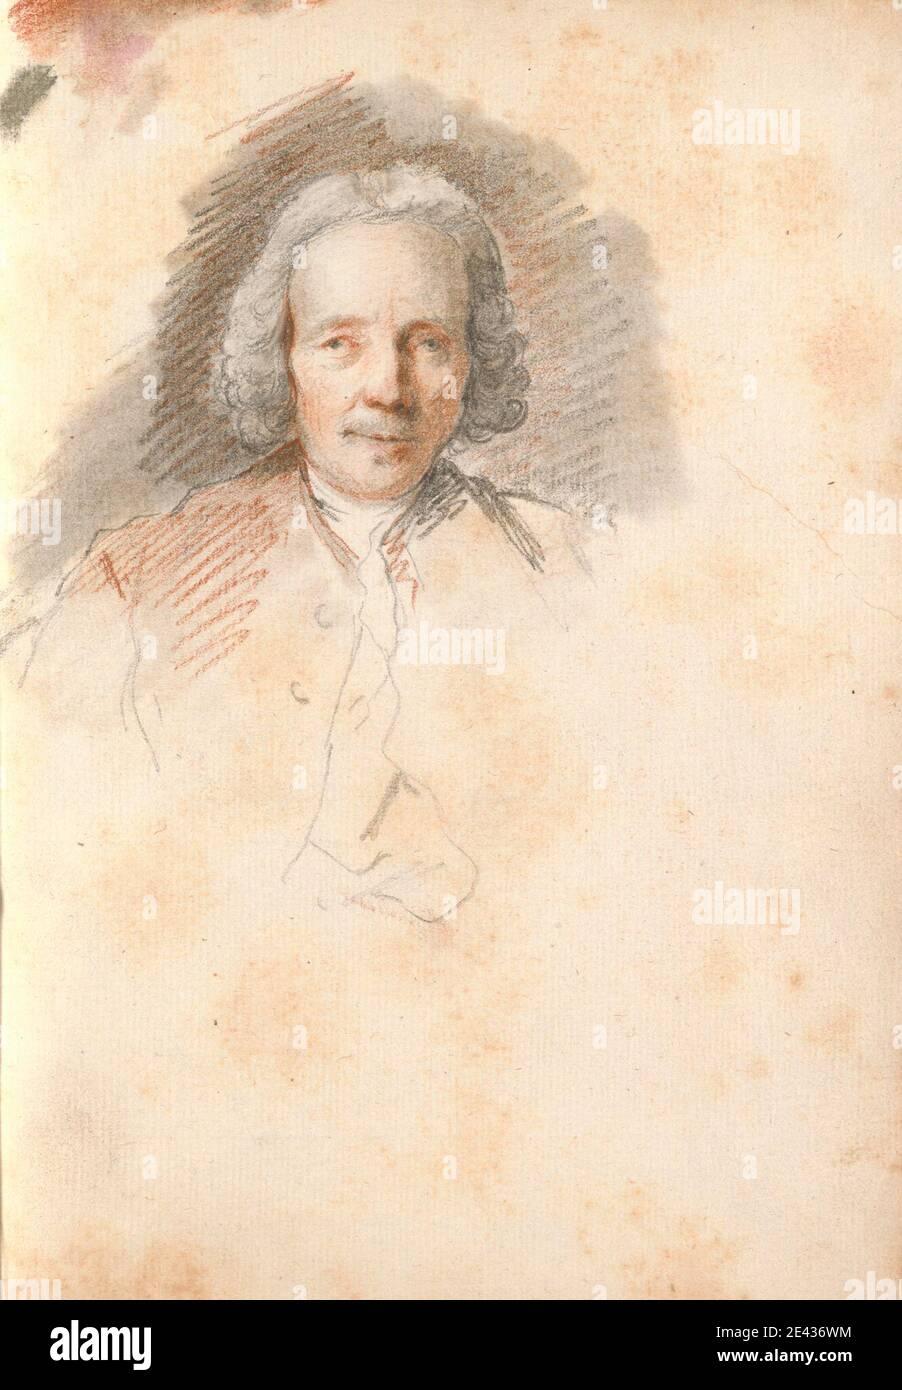 Thomas Patch, 1725–1782, British, Head of an Elderly Man, 1760s. Black chalk, red chalk and gray wash on medium, slightly textured, cream laid paper bound in carta fiorentina.   Grand Tour , portrait Stock Photo